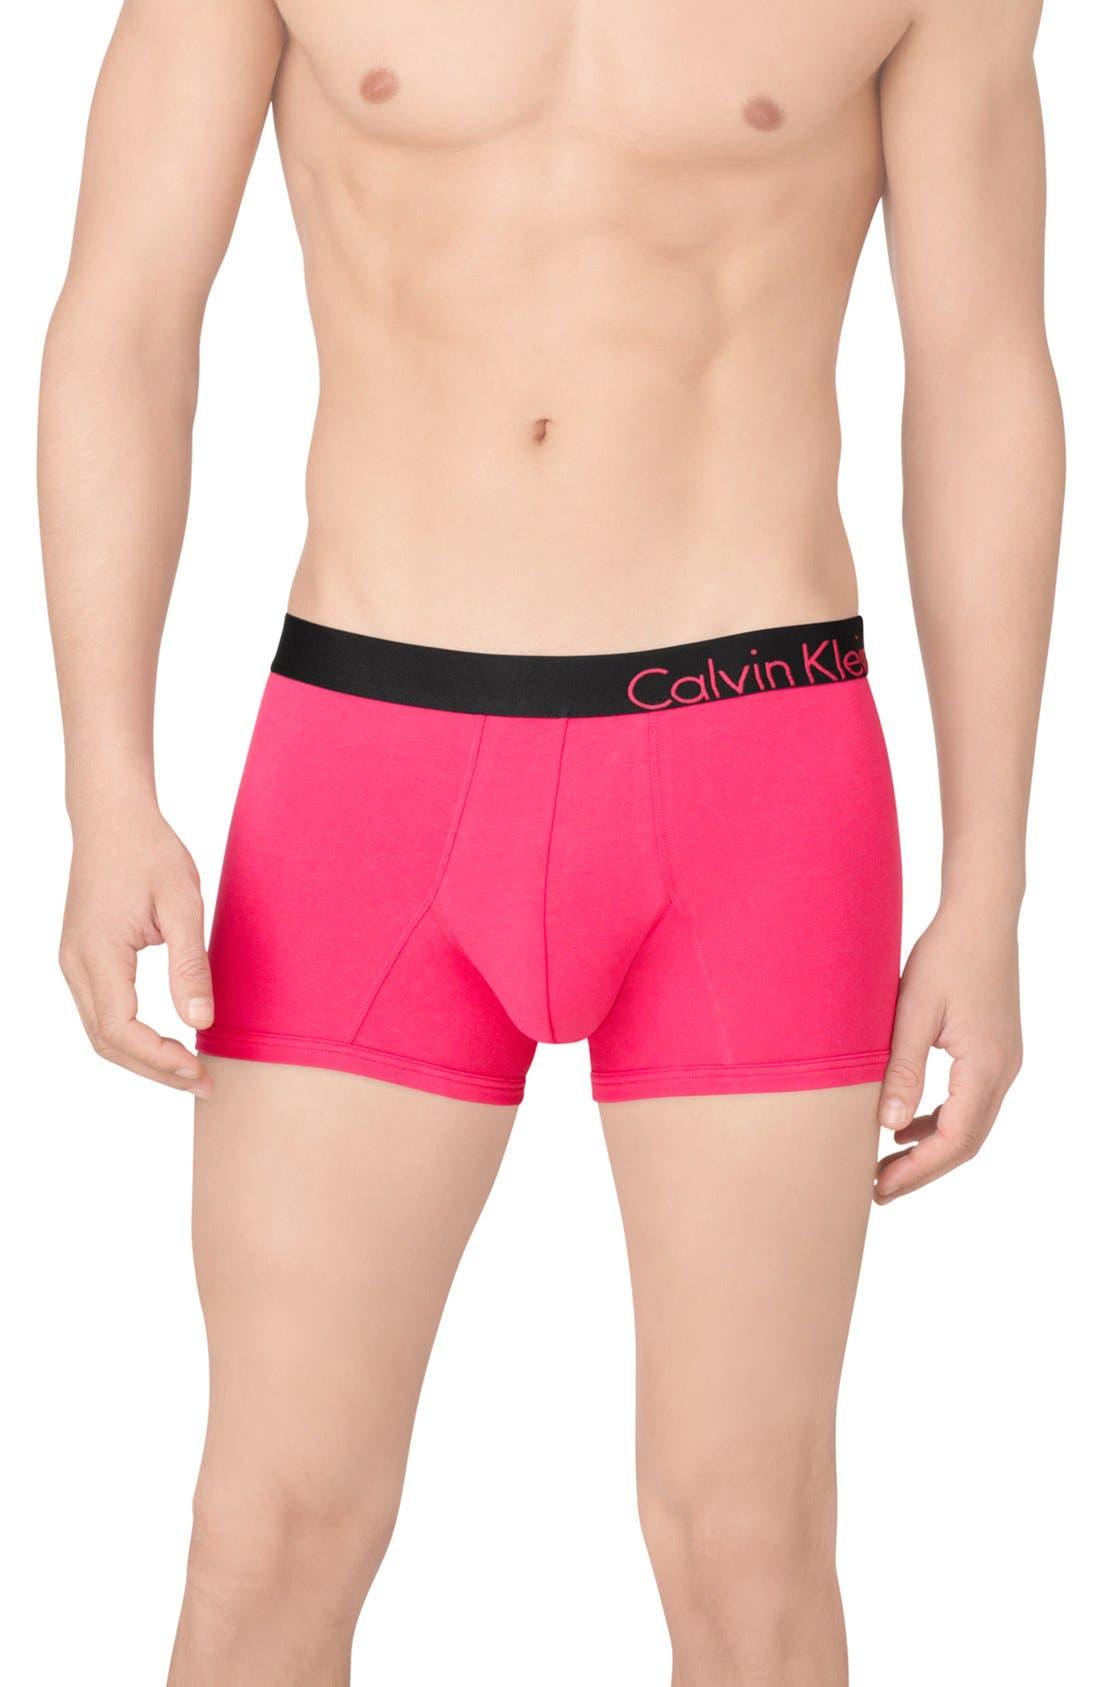 Alternate Image 1 Selected - Calvin Klein 'Bold Cotton - U8902' Trunks (Online Only)